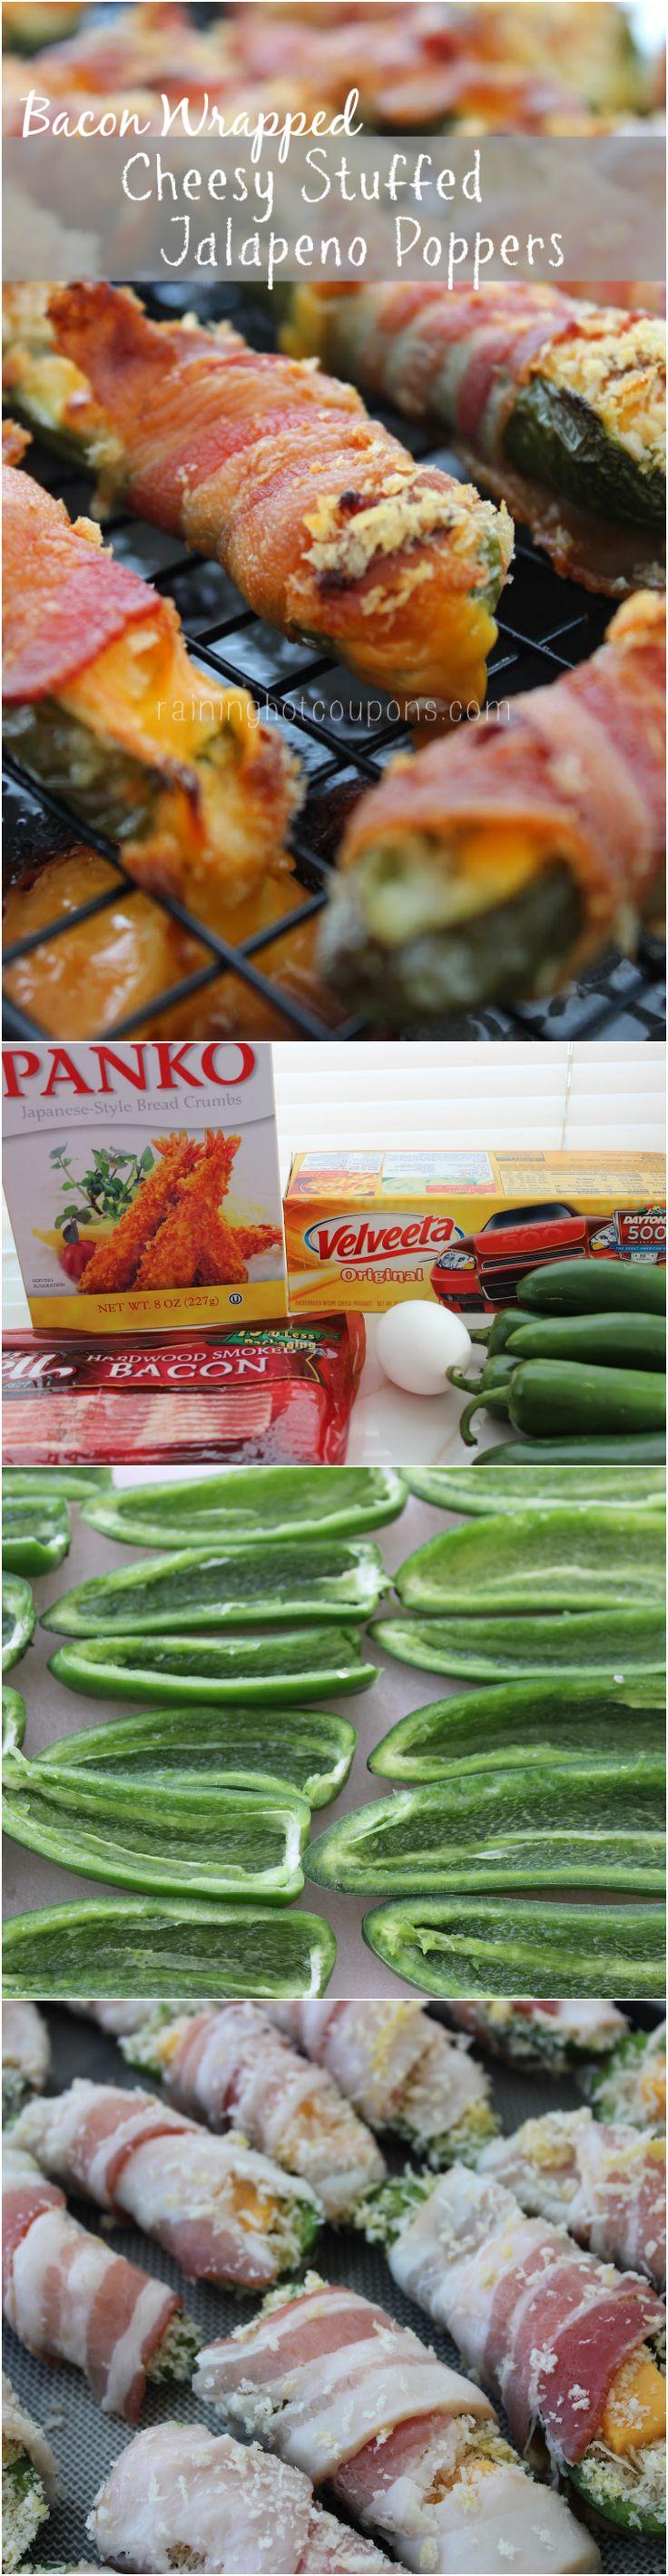 Bacon Wrapped Velveeta Cheesy Stuffed Jalapeno Poppers